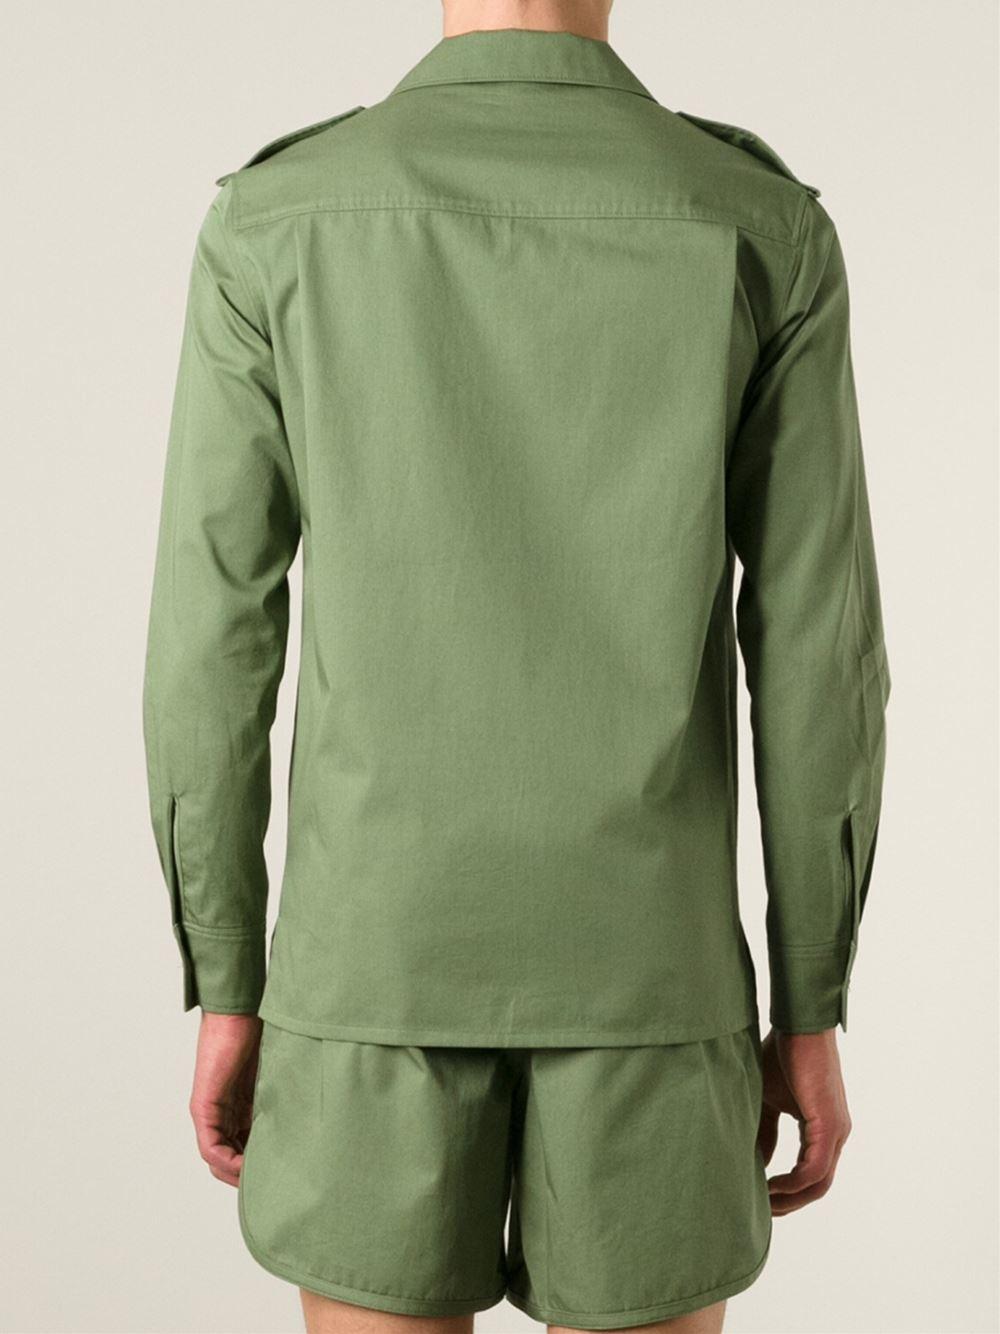 Safari Shirt Cognac Heels: Maison Kitsuné Safari Shirt In Green For Men